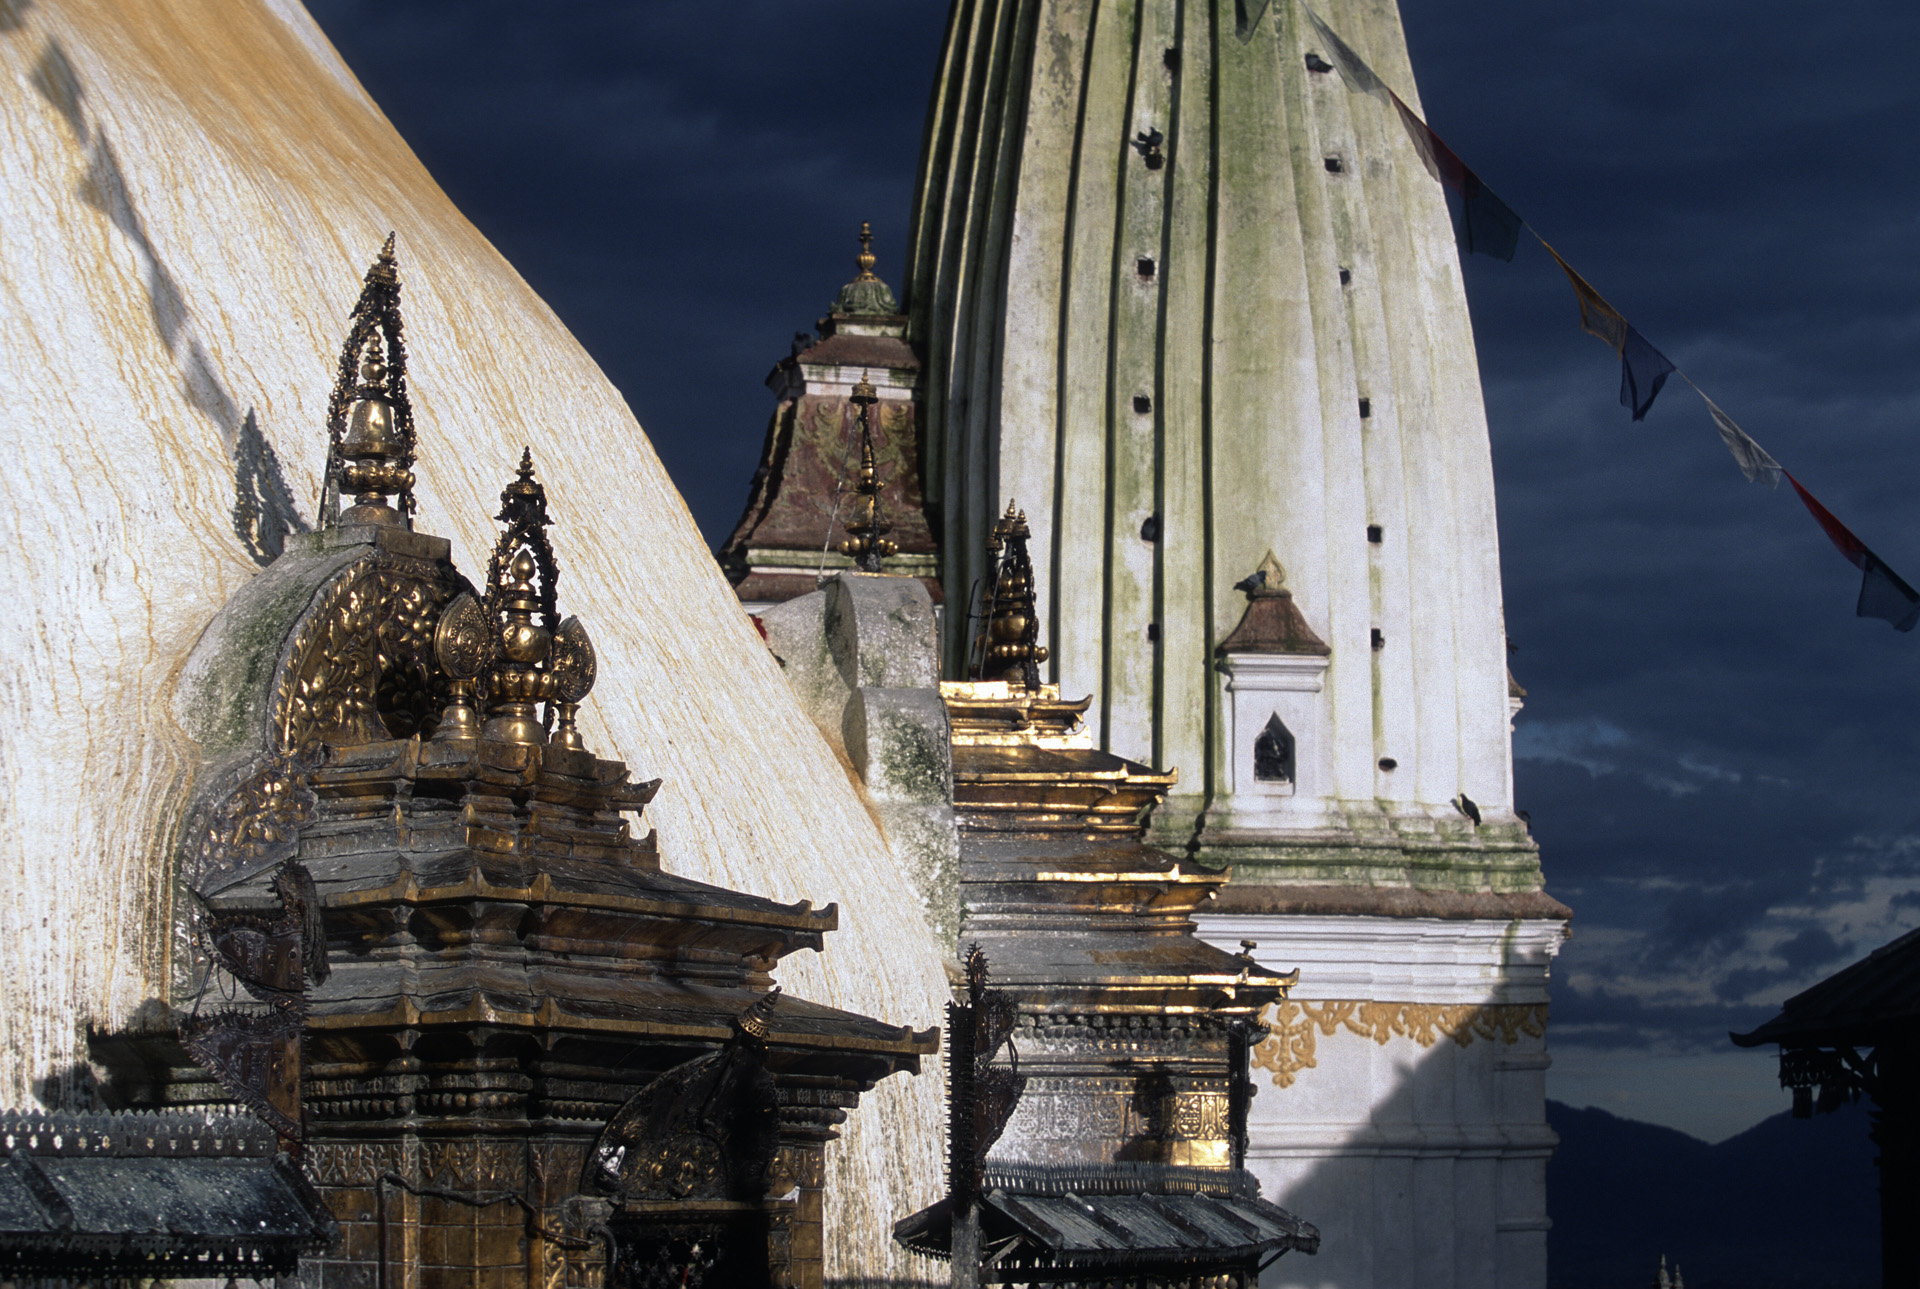 Swayambhunath or The Monkey Temple in Kathmandu